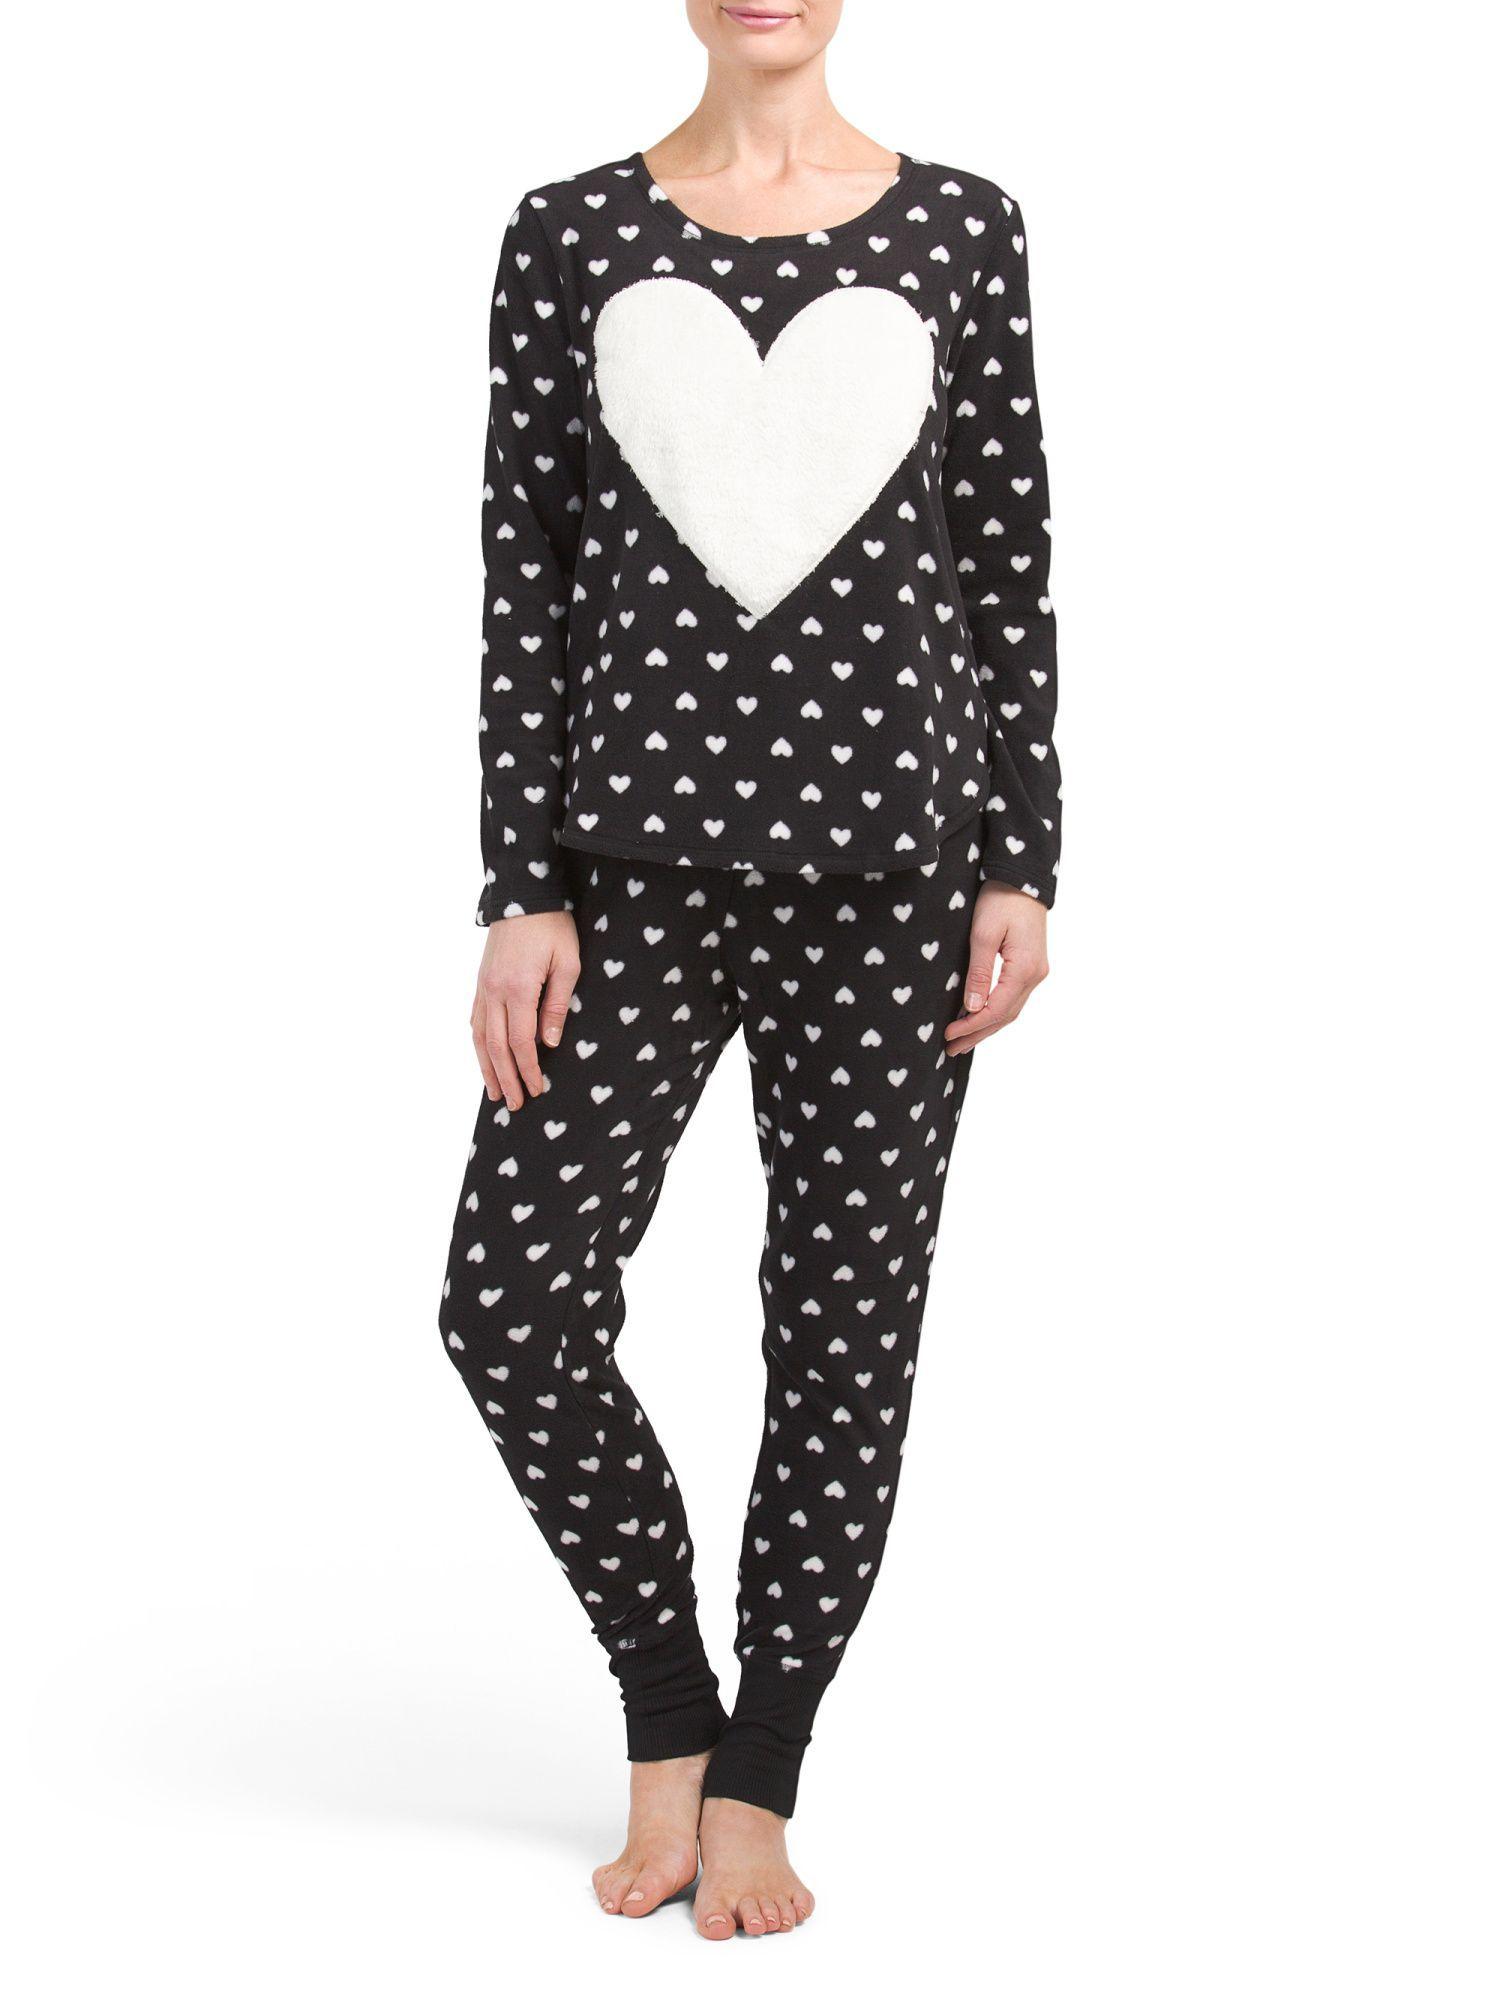 0cdf39b3cd0c Heart Joggers Fleece Pajama Set